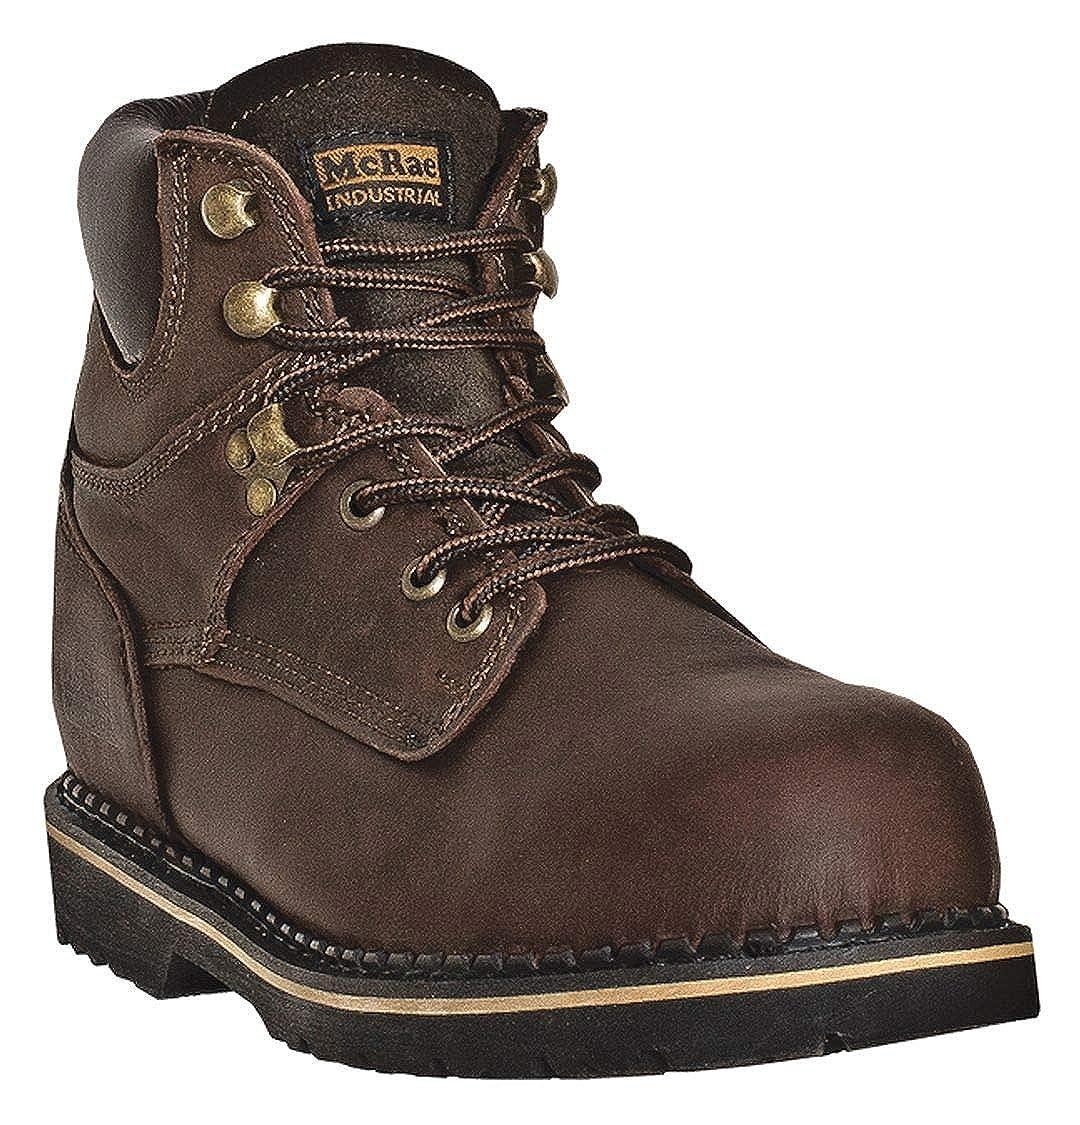 Toe Type: Steel MR86344 Size 14 PR Mcrae Work Boots